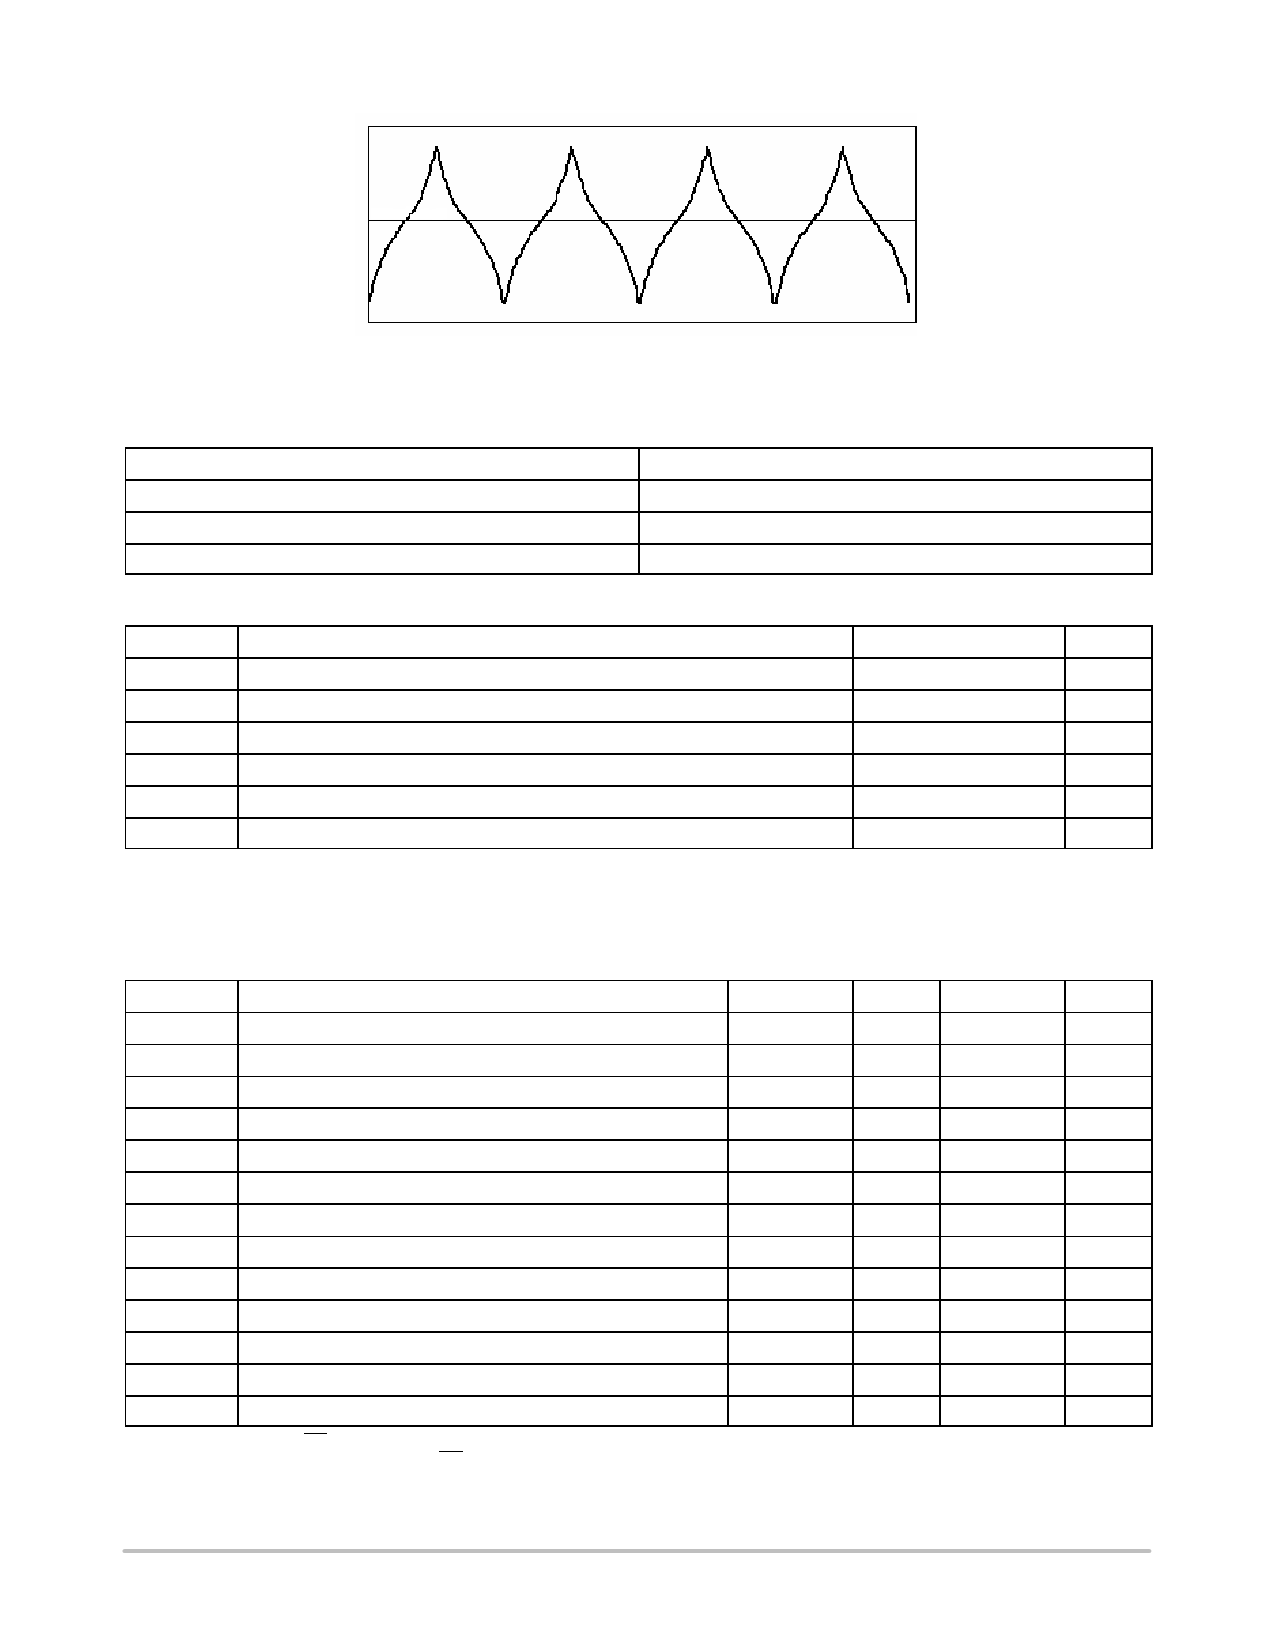 ASM3P2775A pdf, 電子部品, 半導体, ピン配列